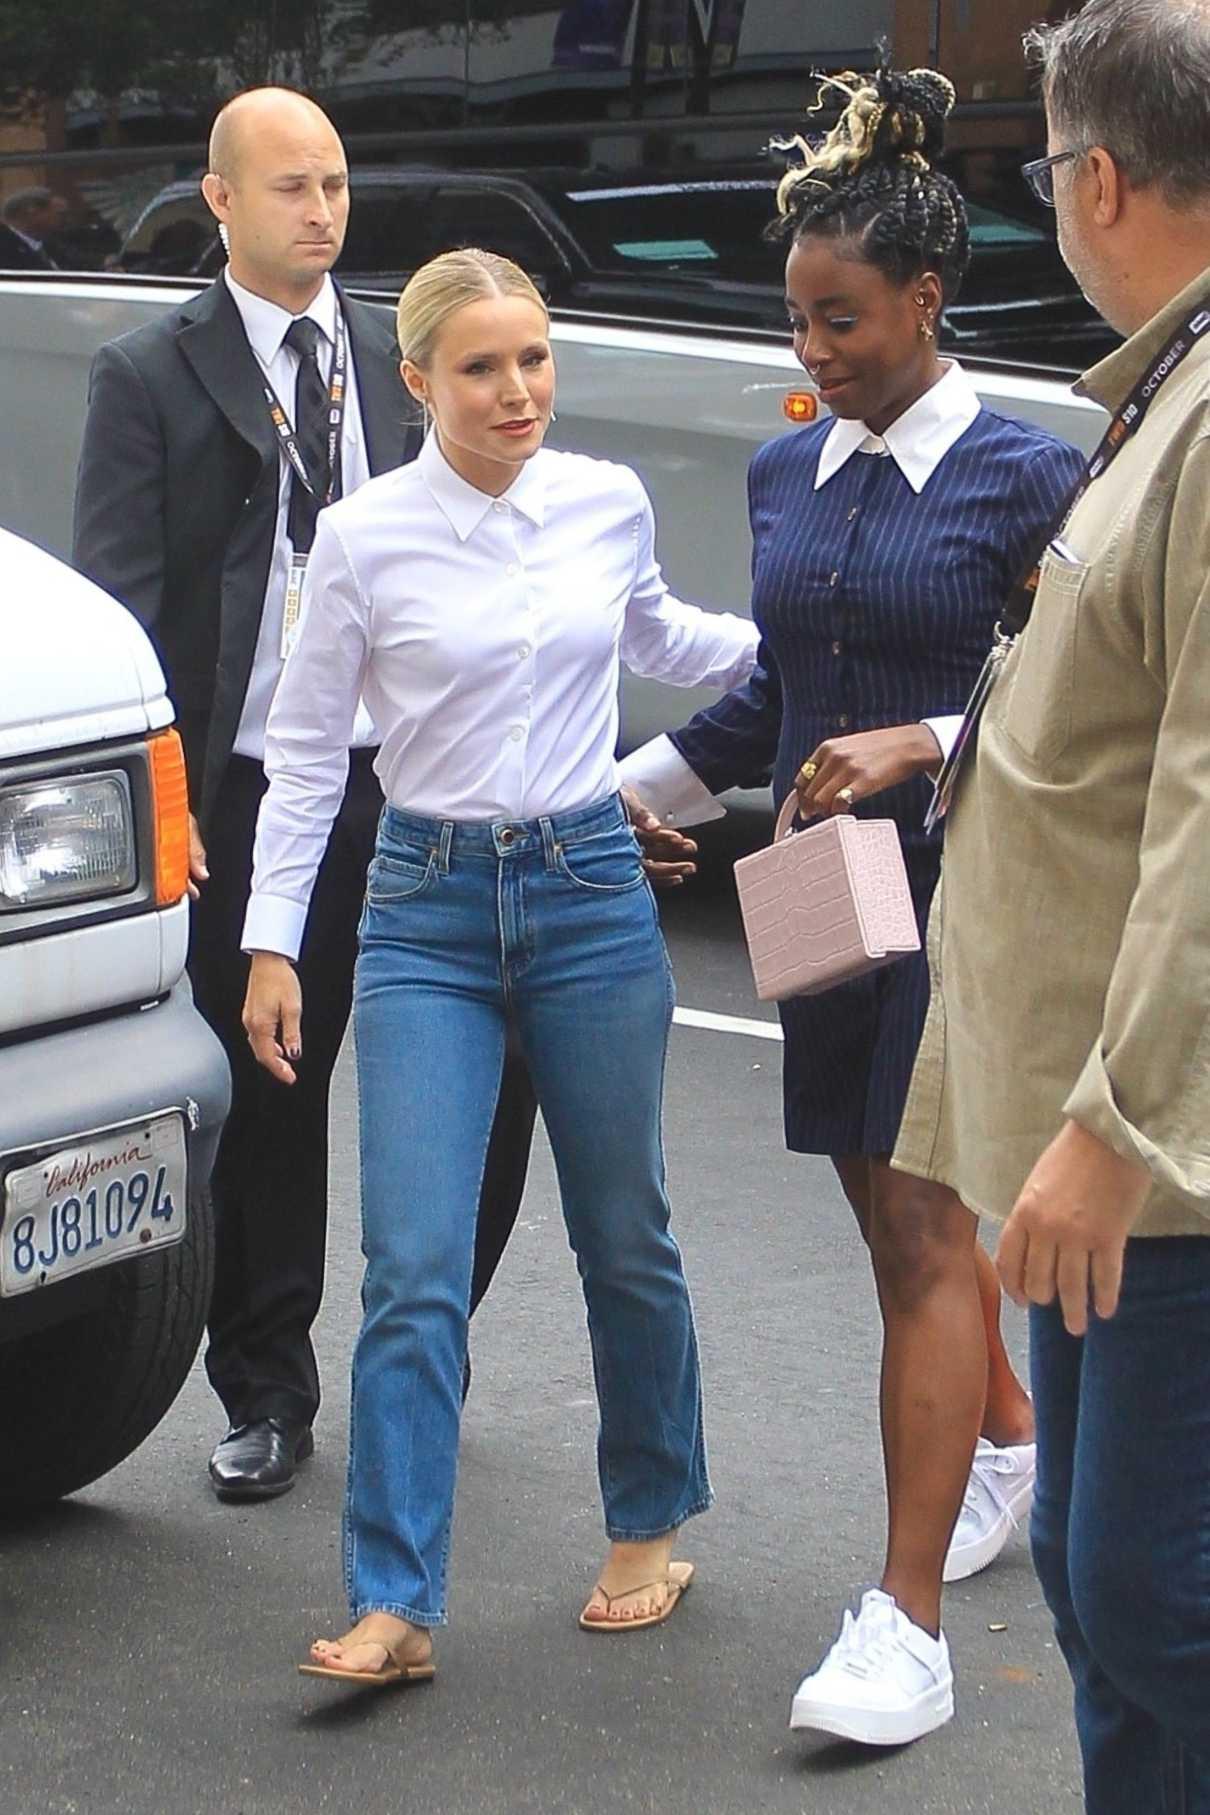 Kristen Bell in a White Shirt